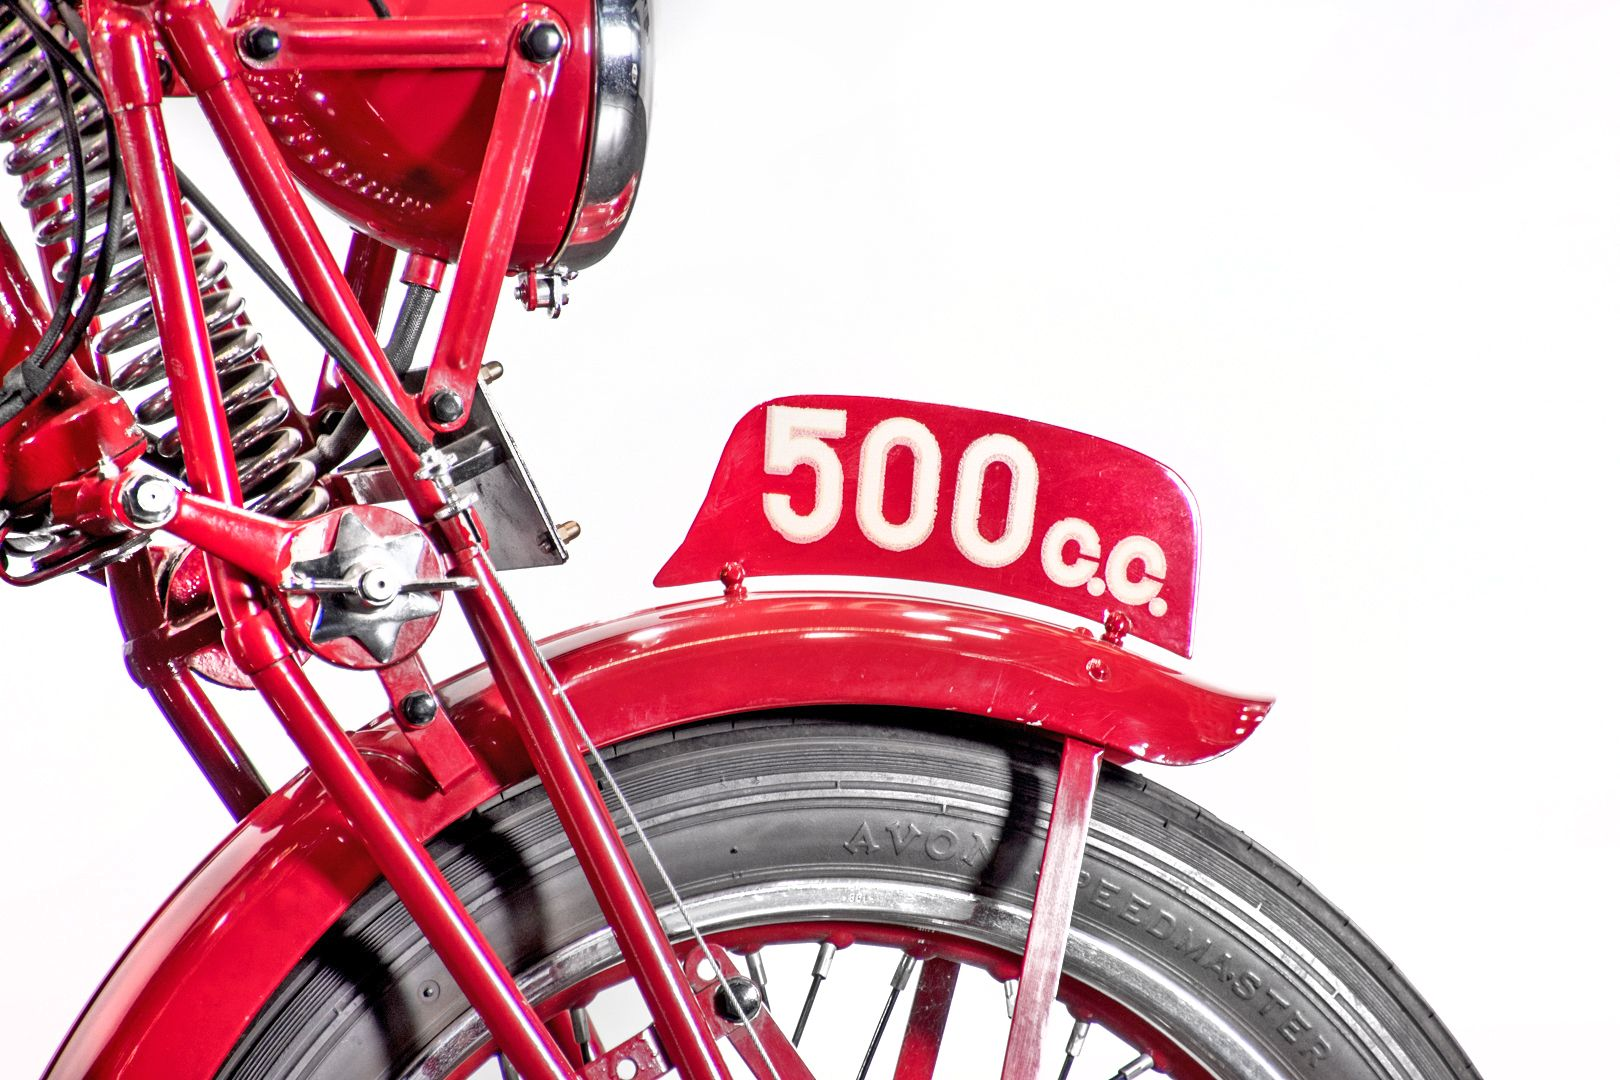 1939 Benelli 500 4TS 74475